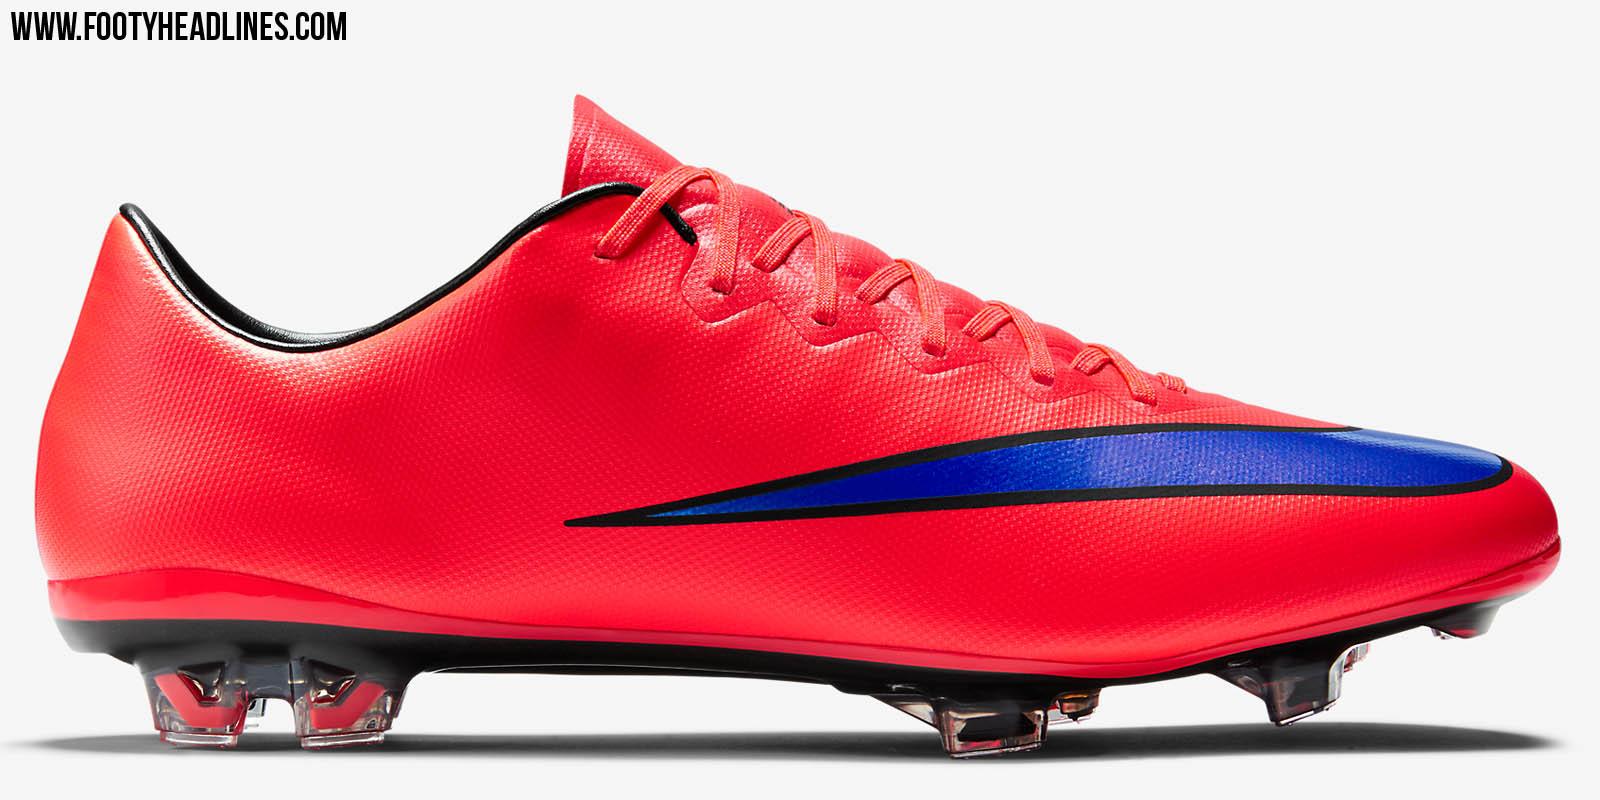 Nike mercurial vapor 10 2017